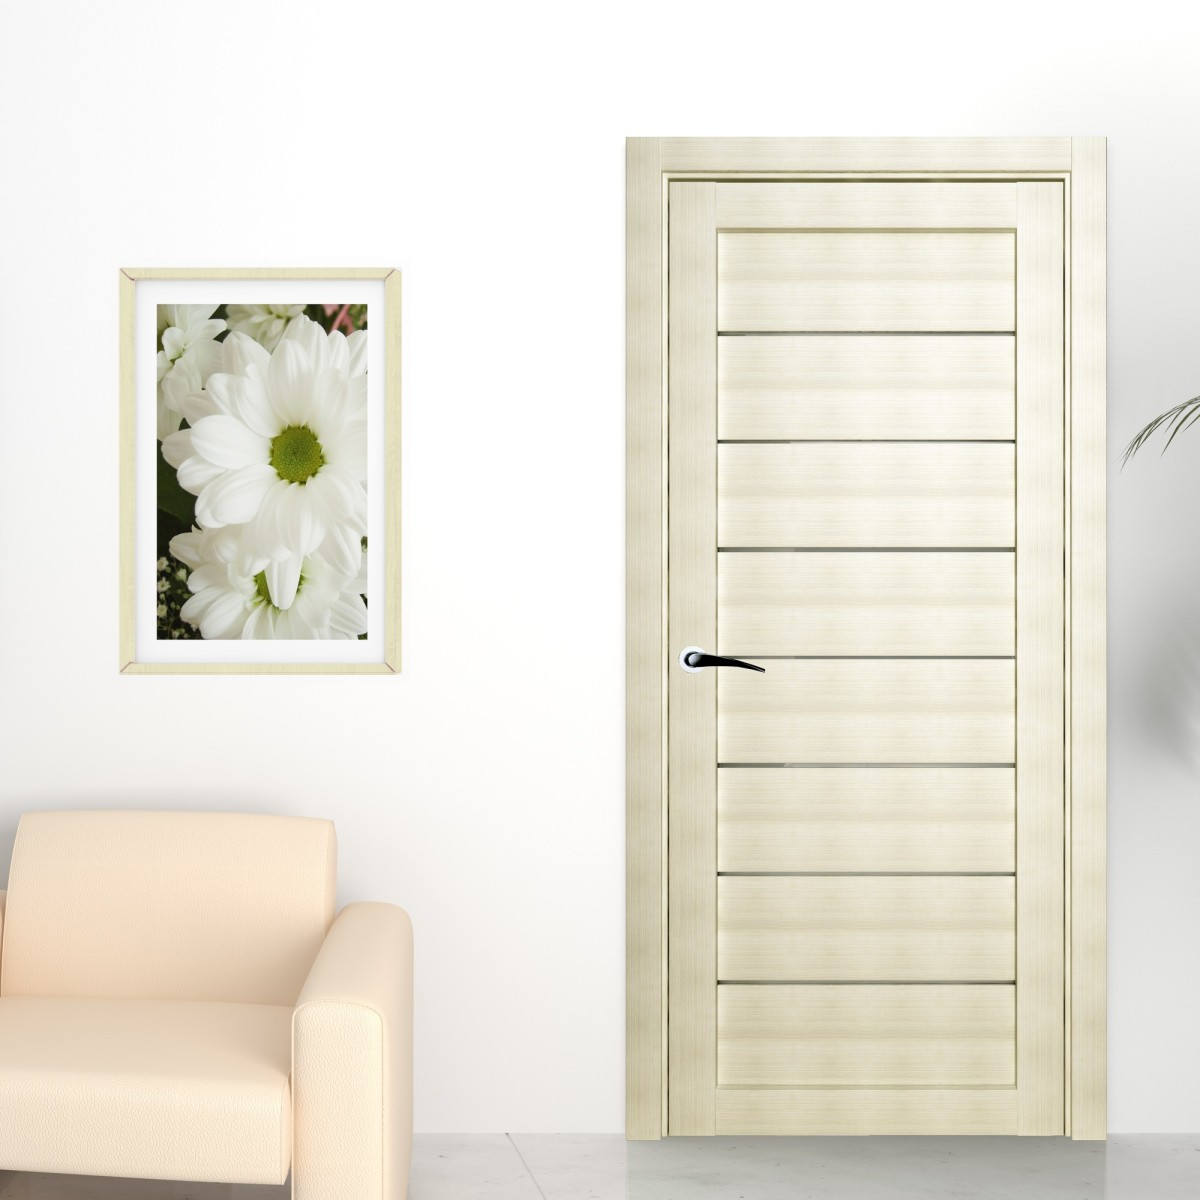 Дверь межкомнатная глухая Сабрина 90x200 см ламинация цвет латте с фурнитурой